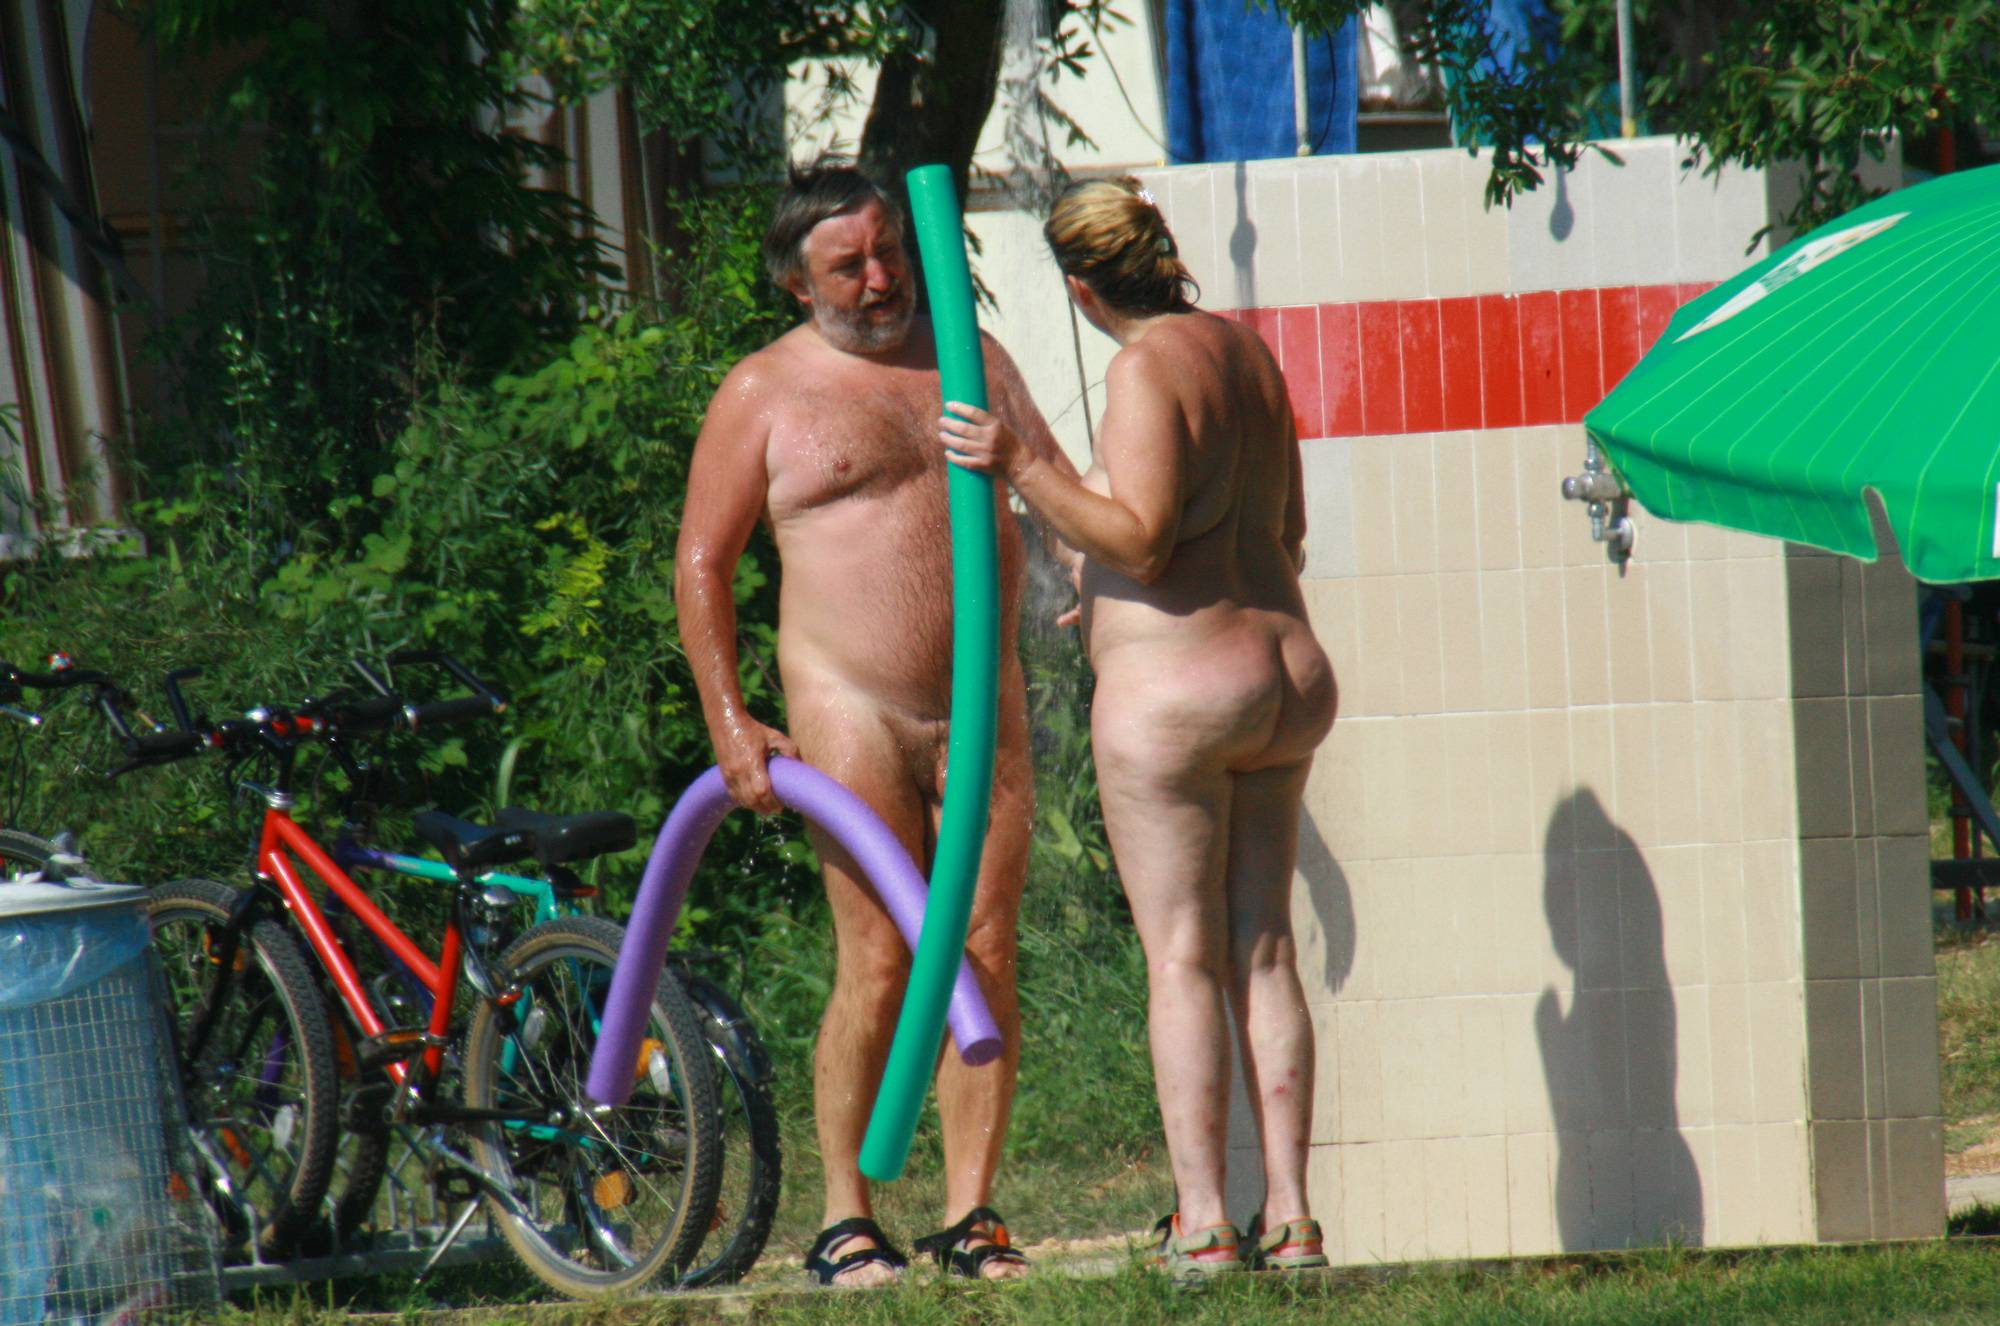 Nudist Pics Early Nudist Member Day - 1